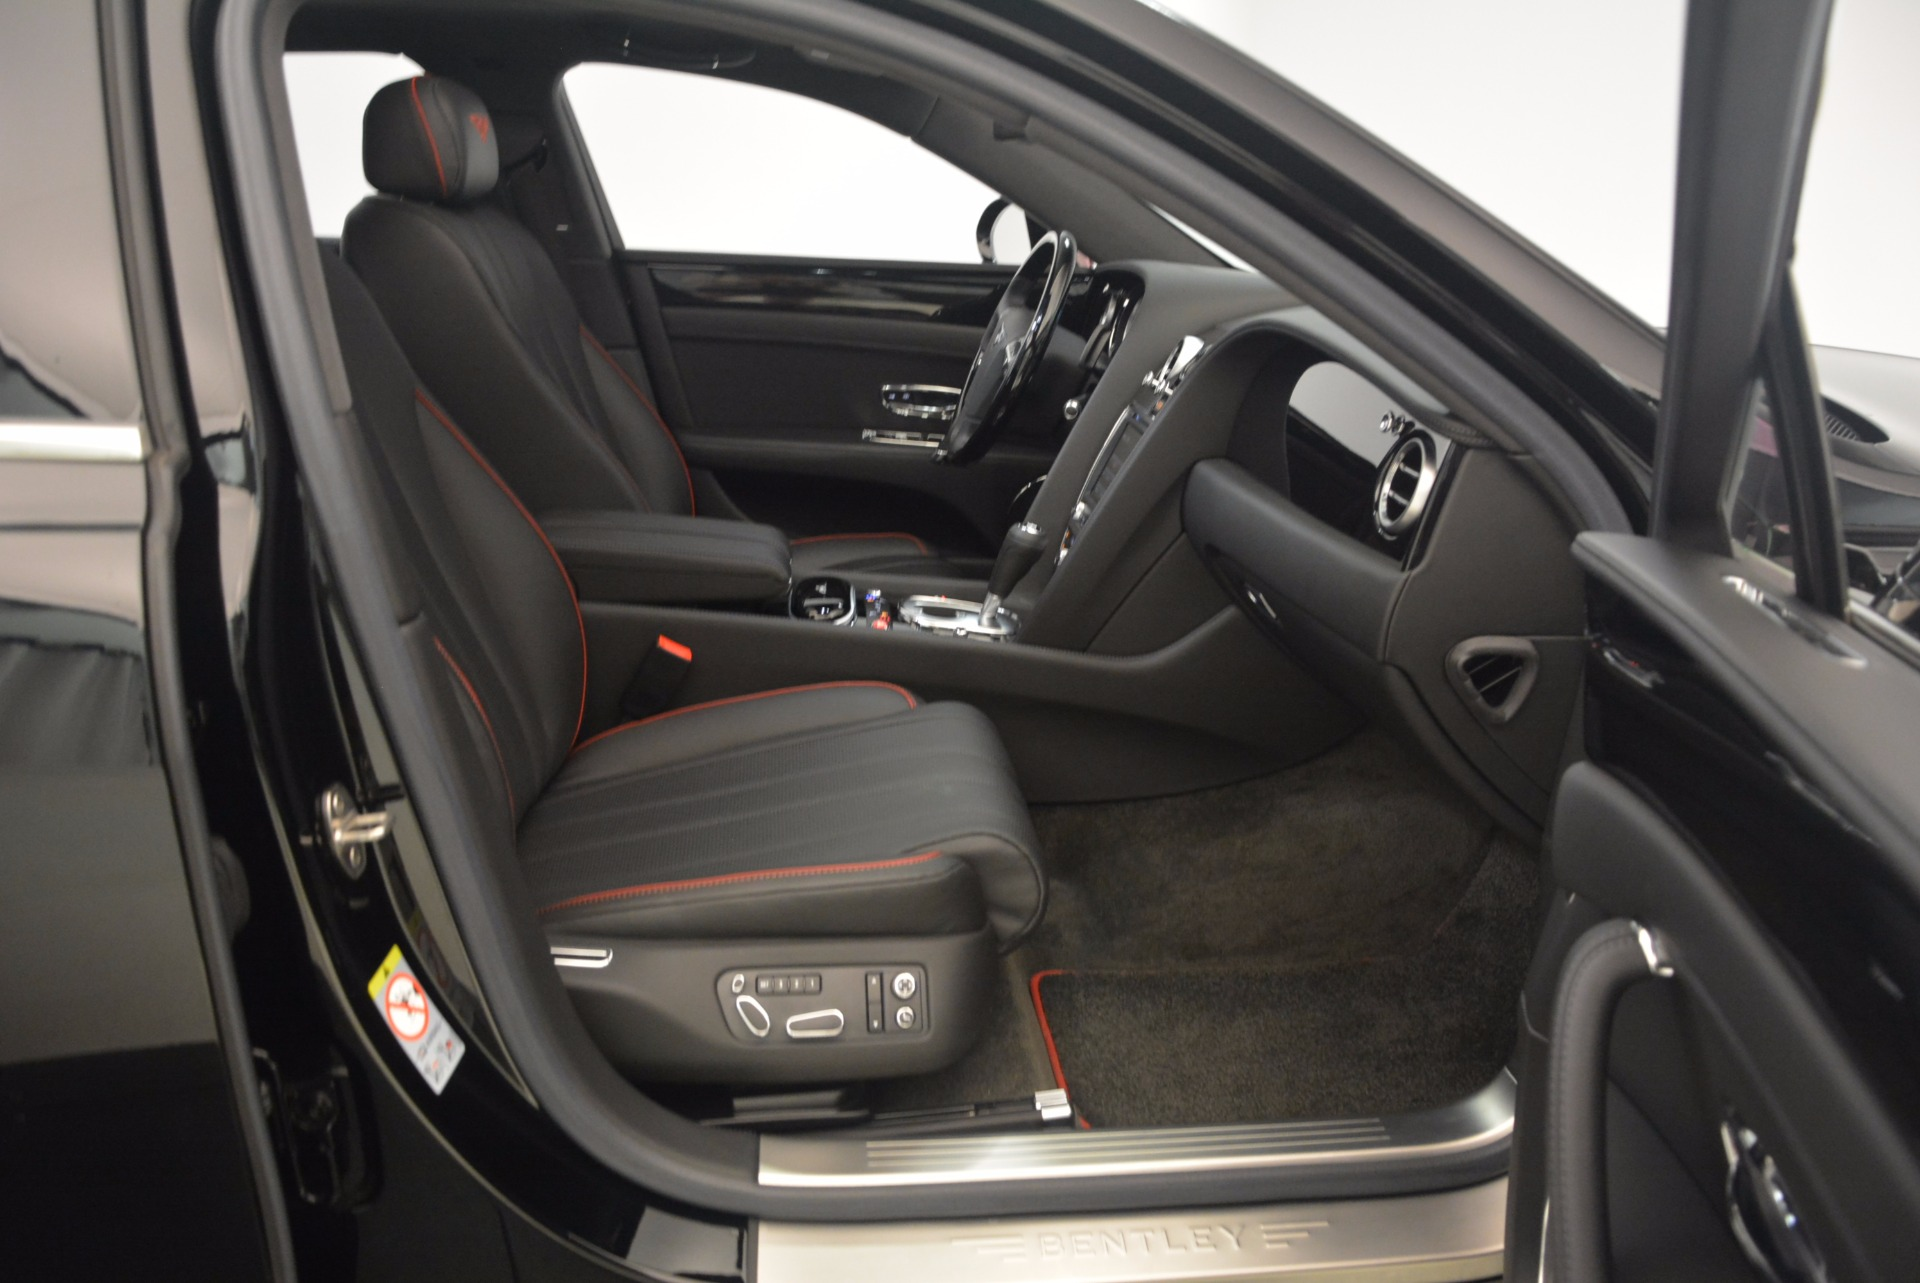 Used 2015 Bentley Flying Spur V8 For Sale In Westport, CT 1199_p42